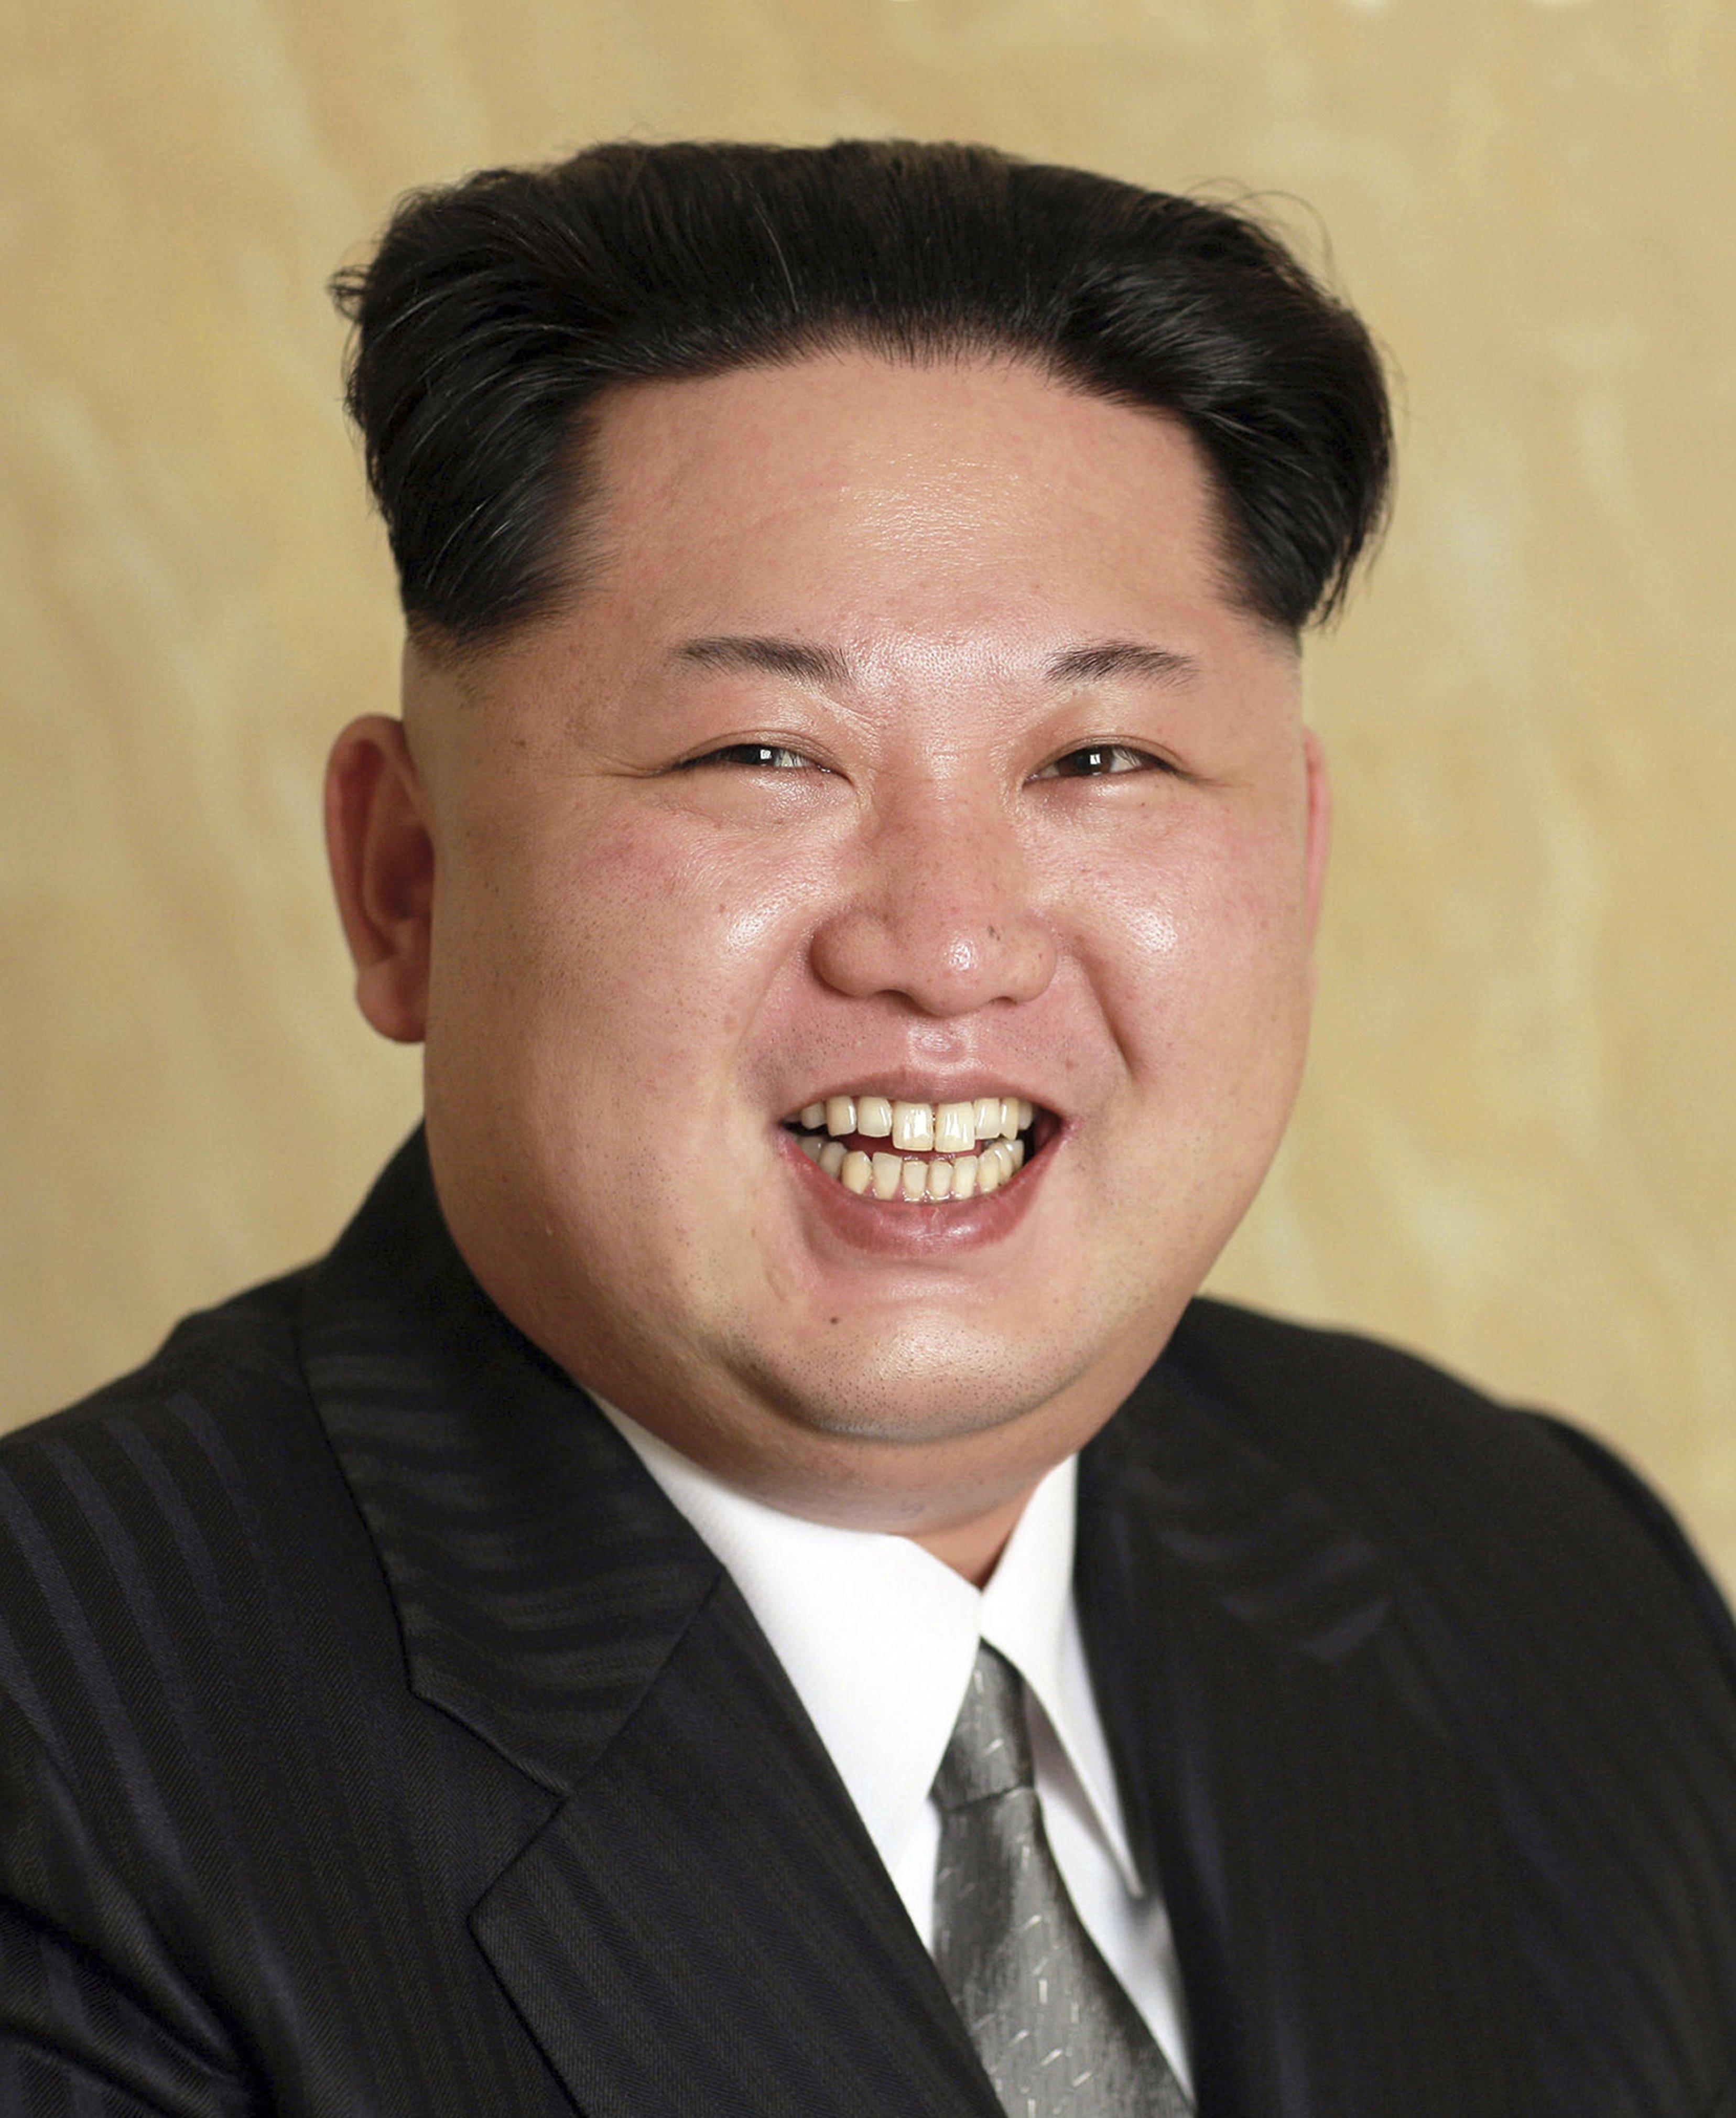 Datei:Kim Jong-un.jpg